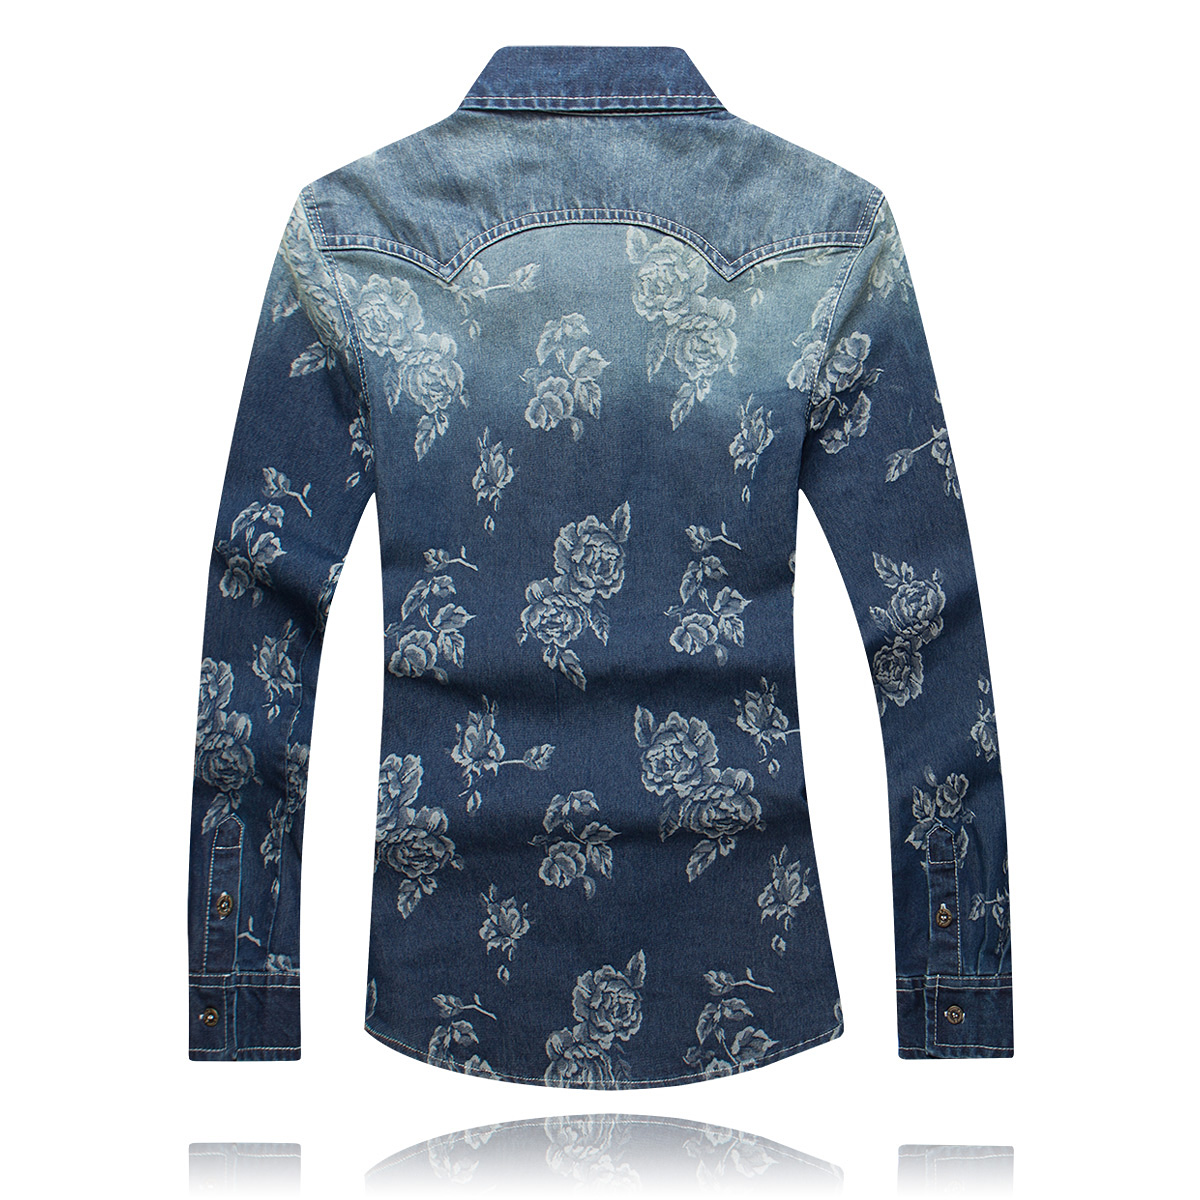 Shirt Jeans Long Sleeve Men 2017 New Male Cotton Jeans Shirt Boy